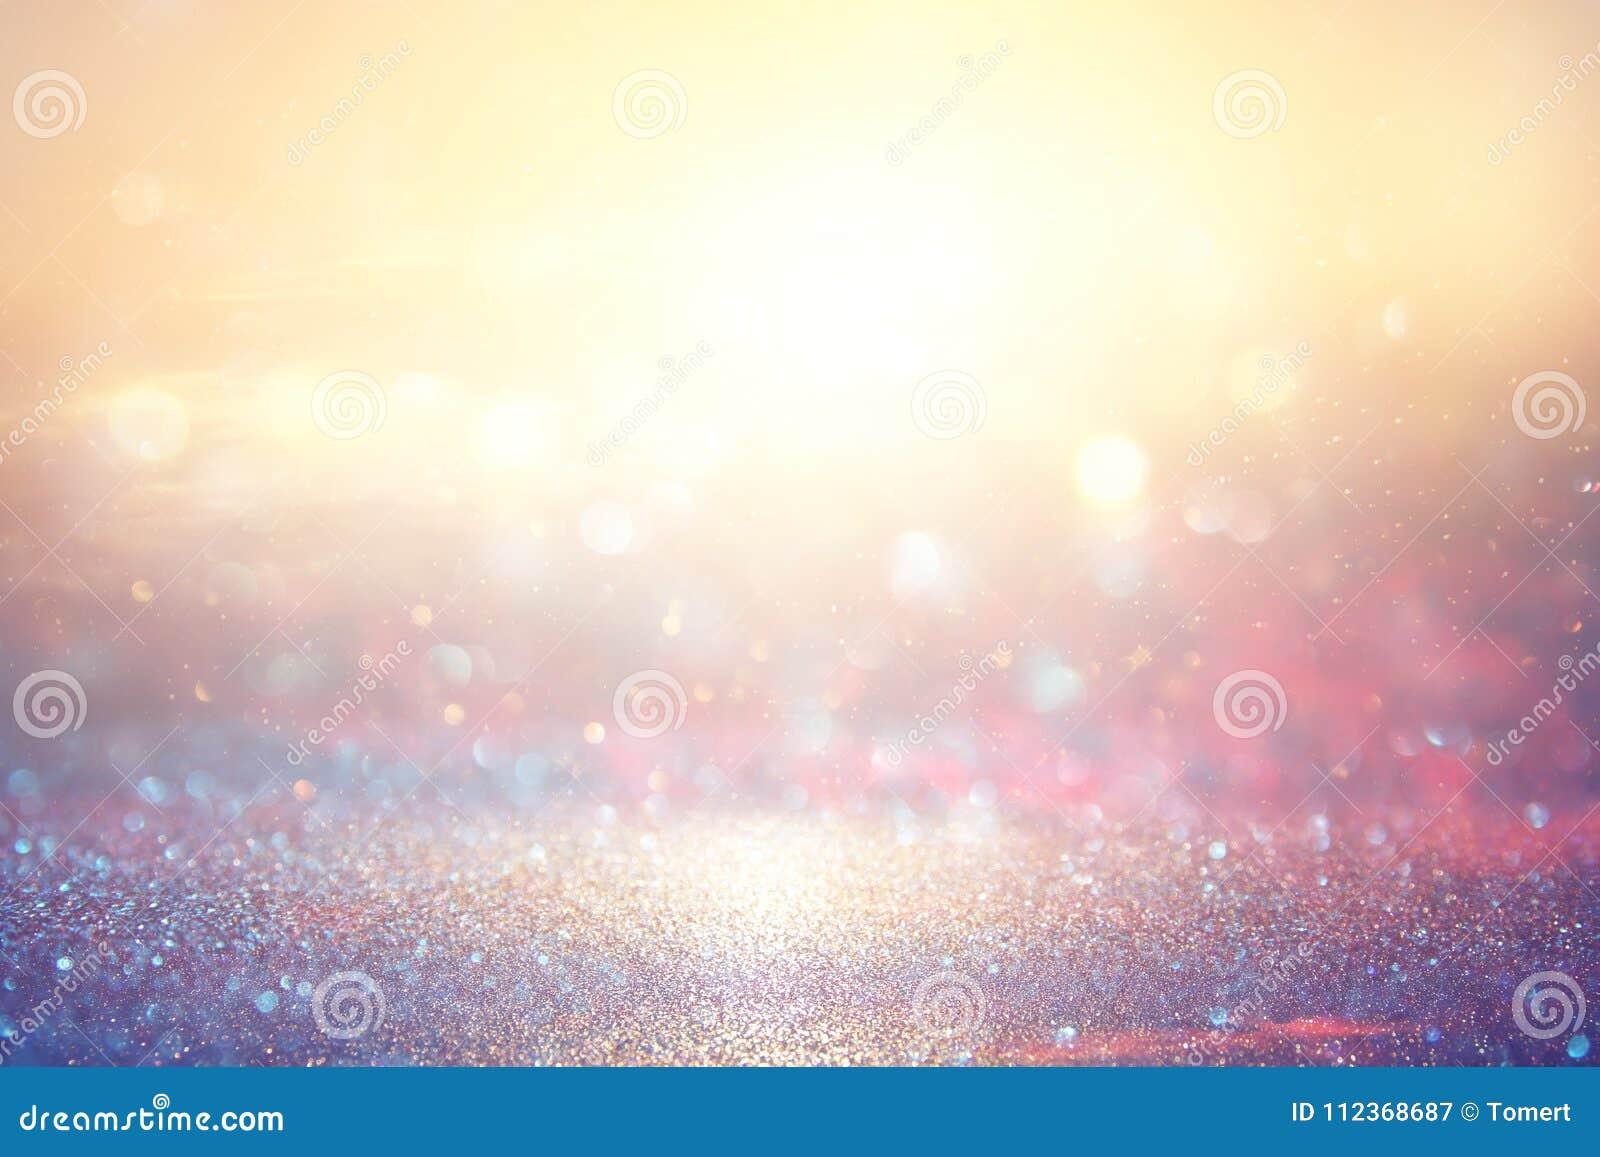 gold and pink glitter lights background. defocused.